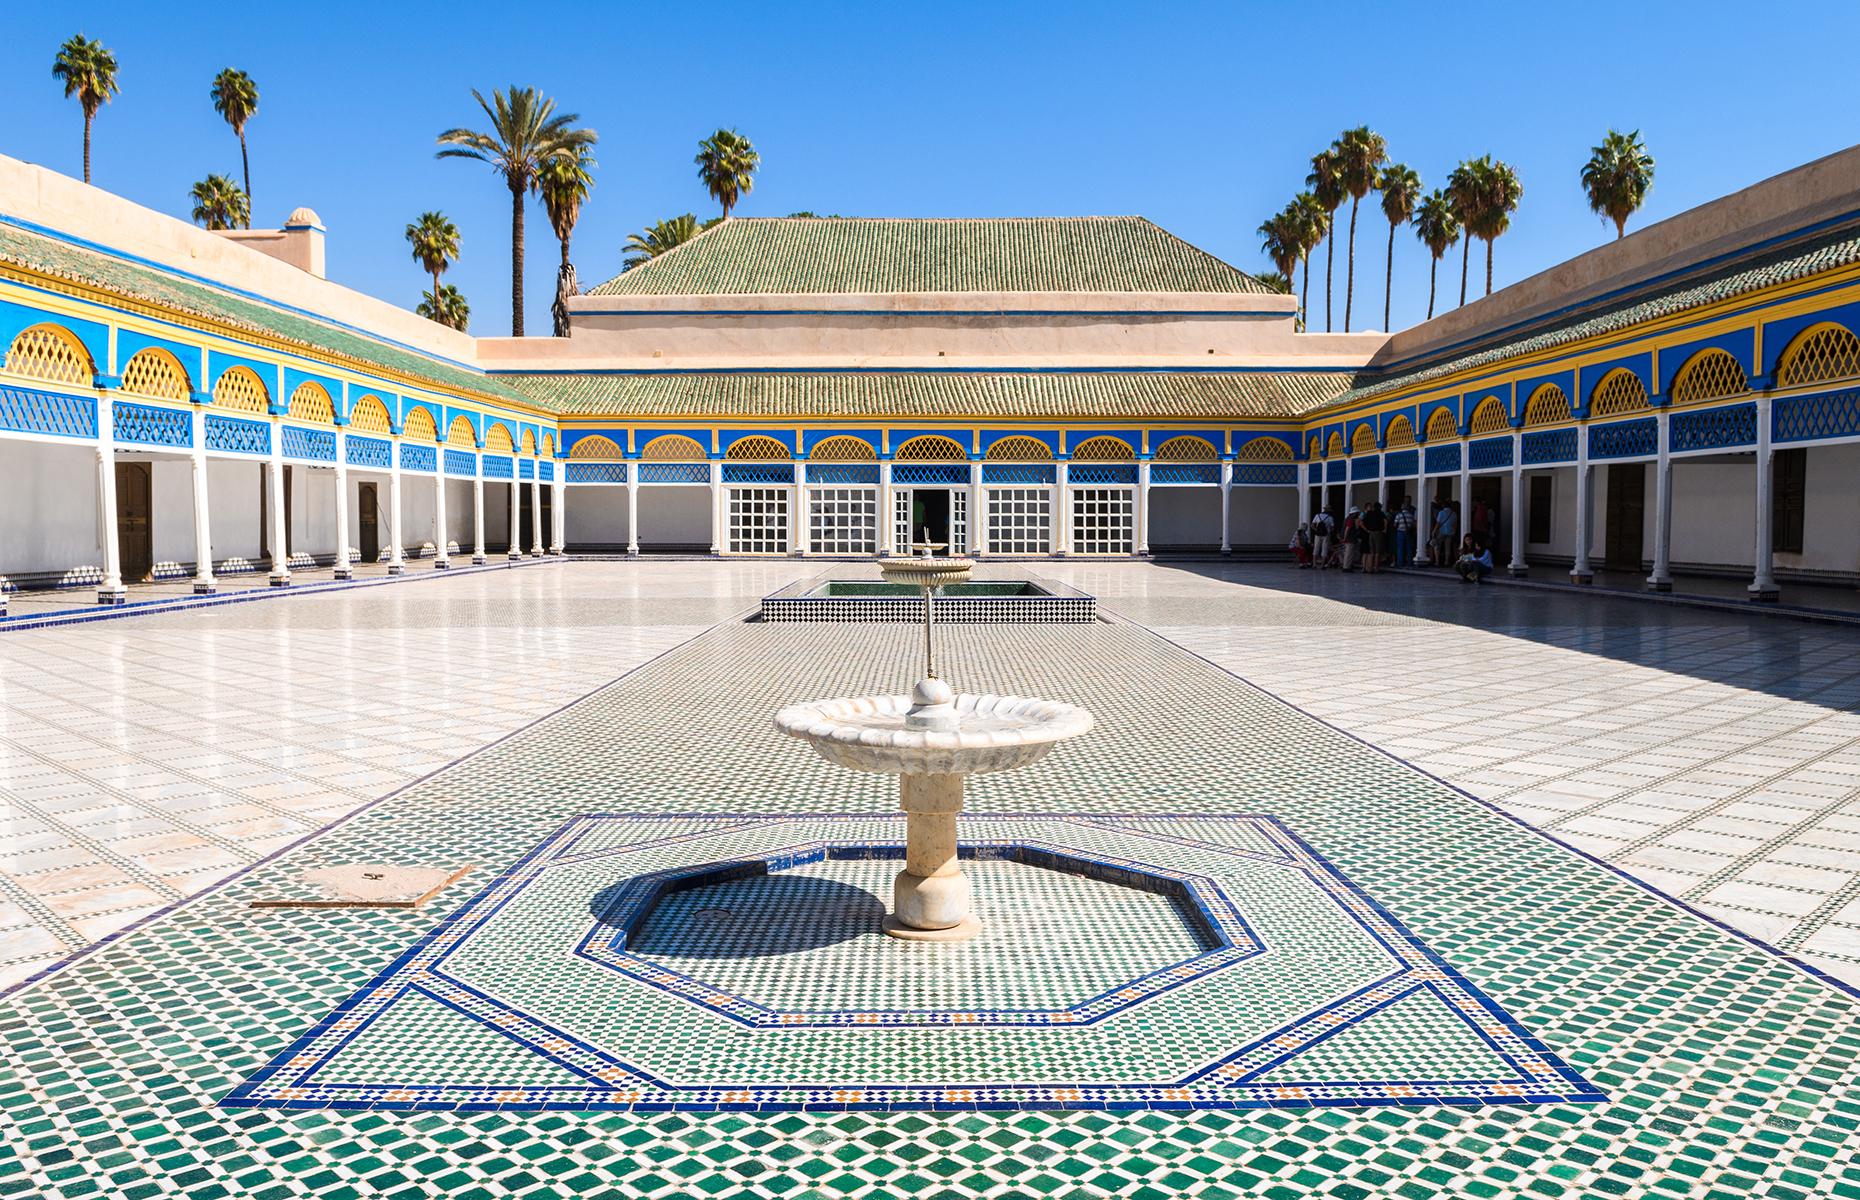 Bahia Palace (Image: Jon Chica/Shutterstock)